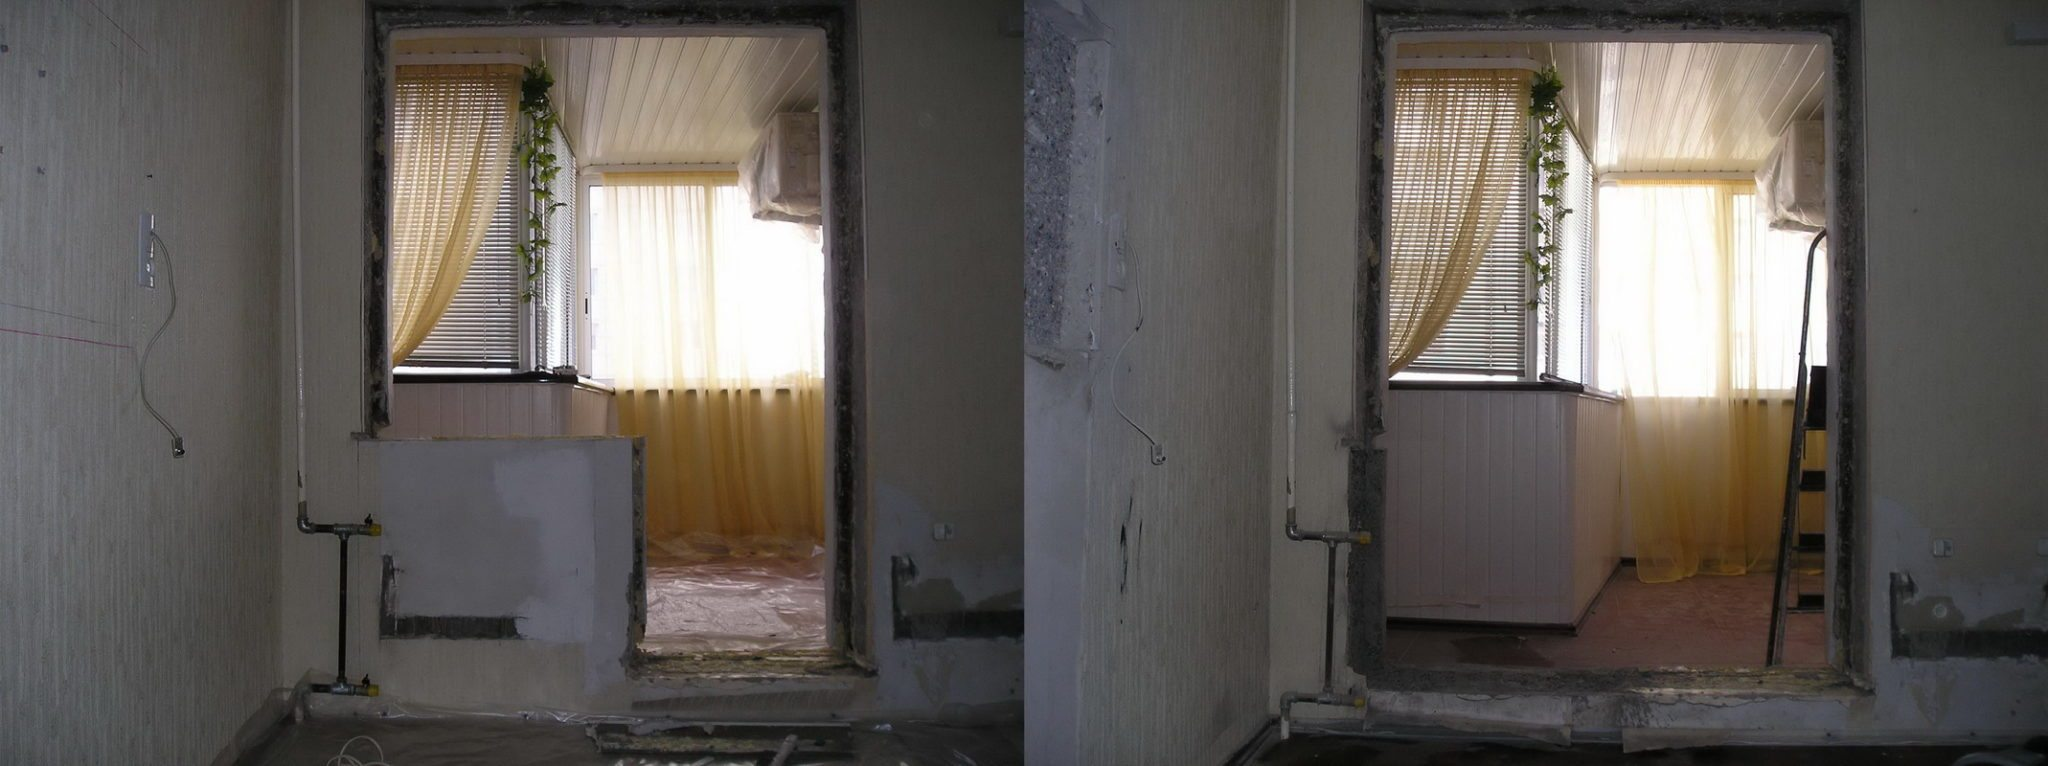 П-44 2-х комнатная квартира балкон размер..